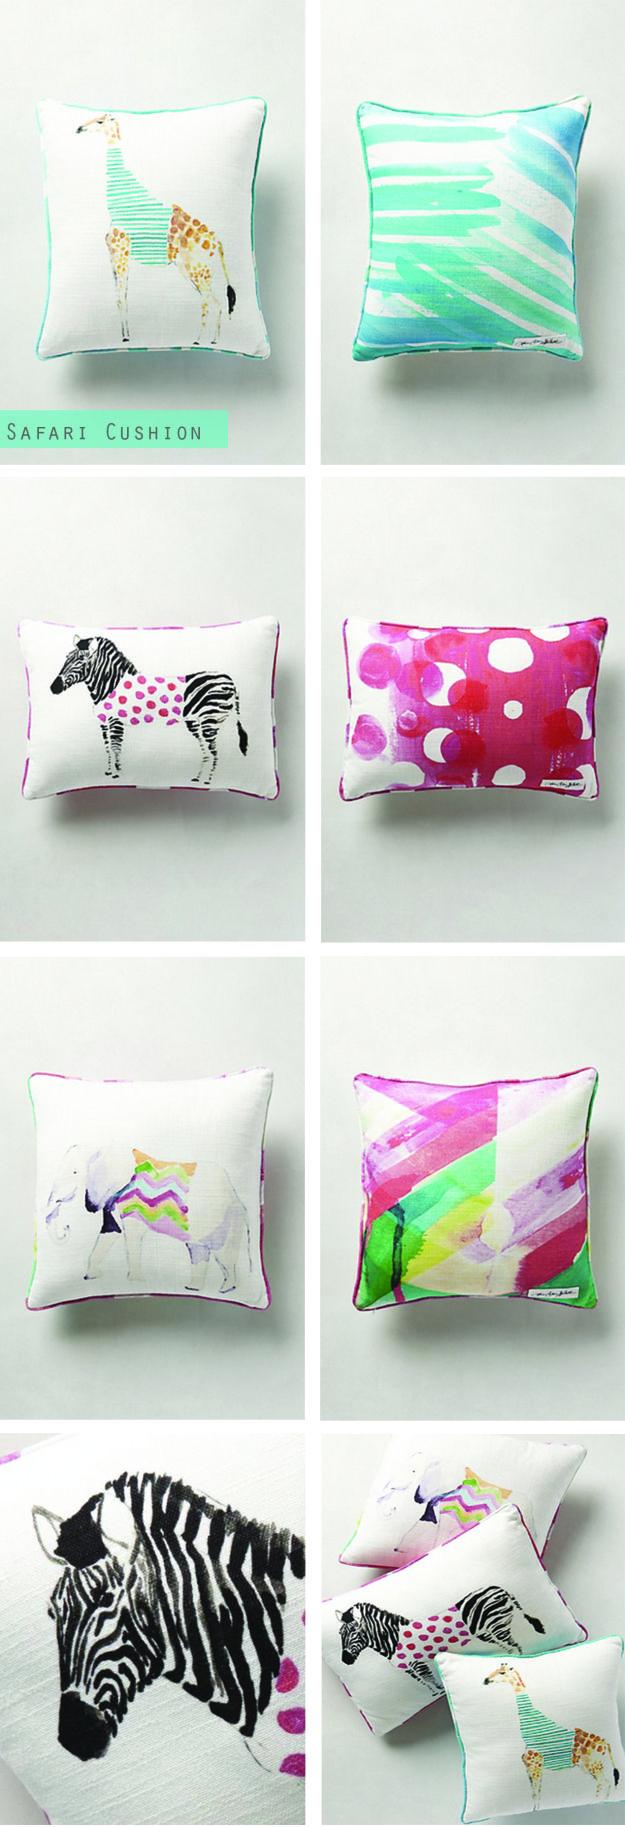 Safari Saunter Cushion by Anthropologie #Anthropologie #pillow #cushion